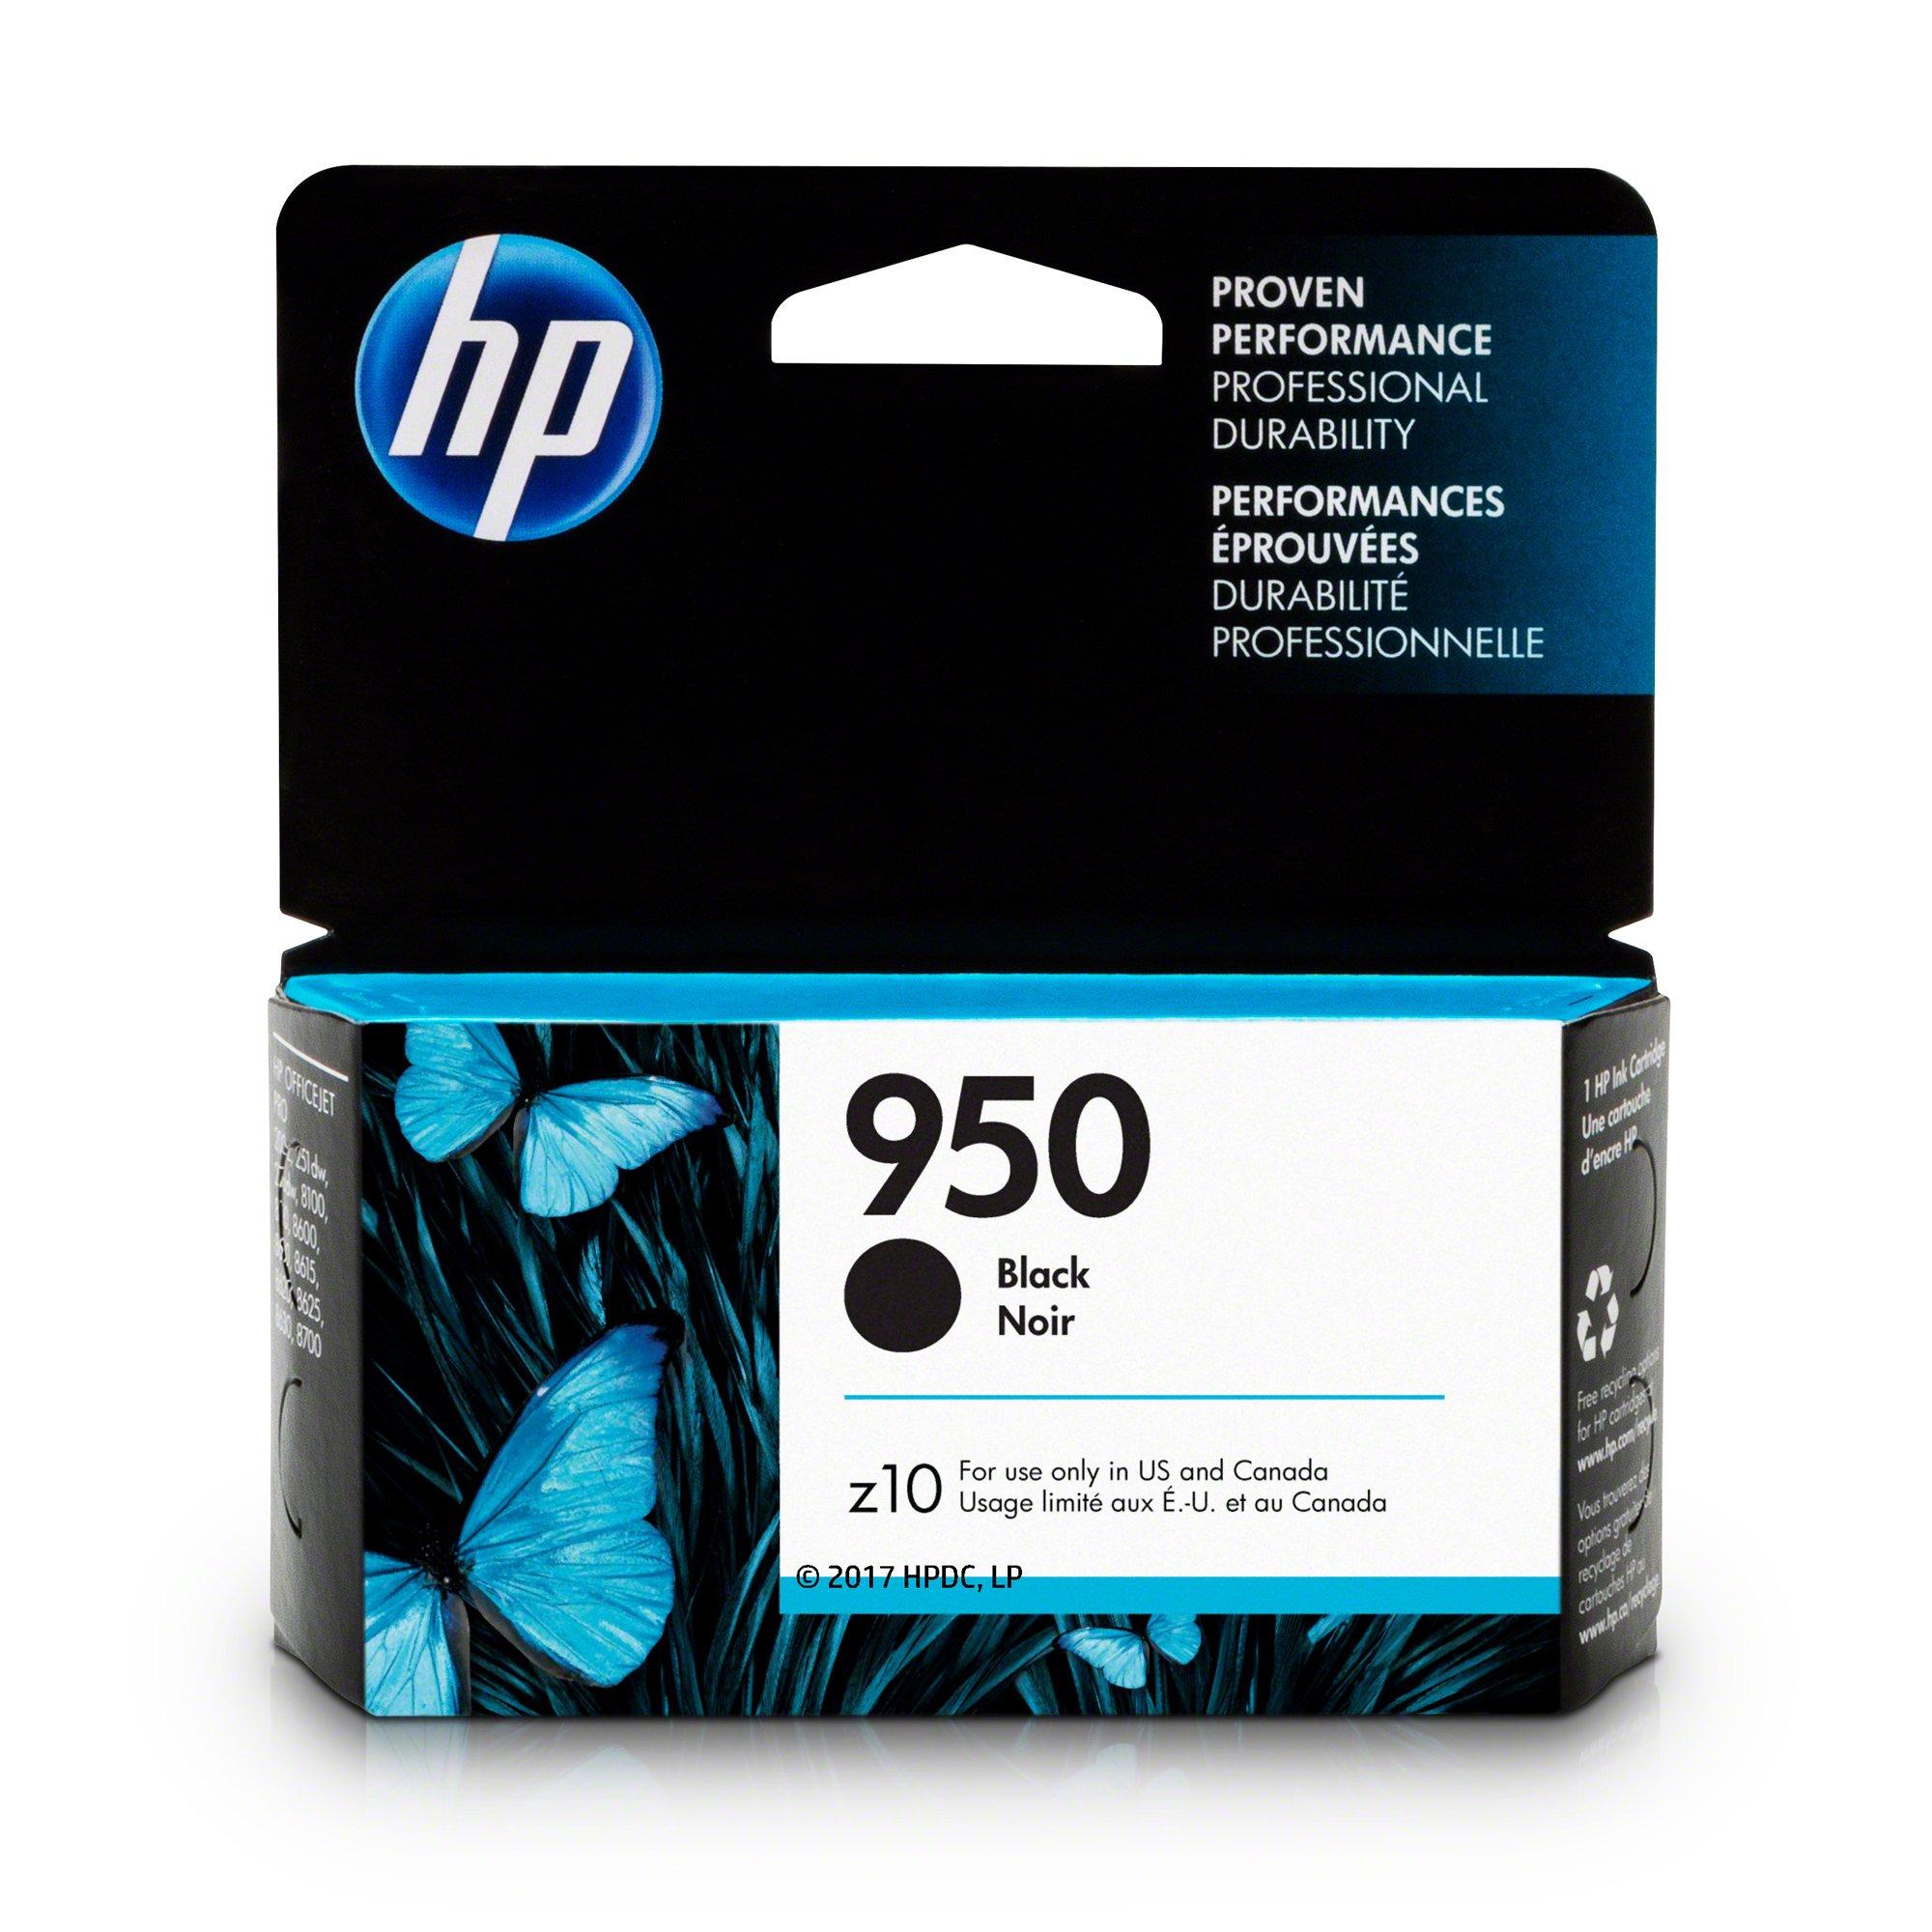 HP CN049AN#140 950 Black Ink Cartridge (CN049AN) for Officejet Pro 251, 276, 8100, 8600, 8610, 8620, 8625, 8630 by HP